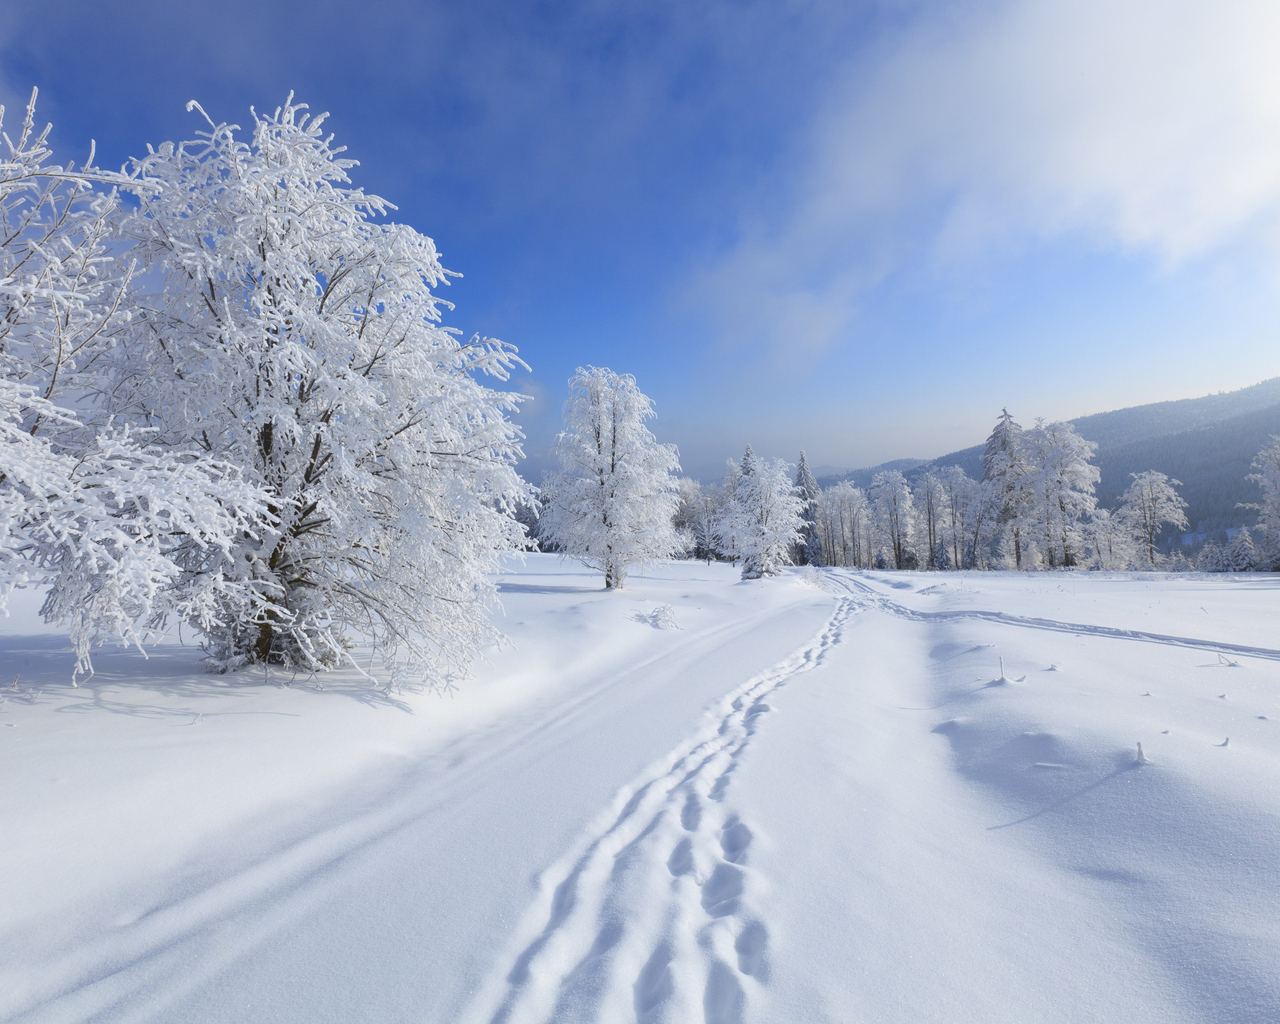 на рабочий зима